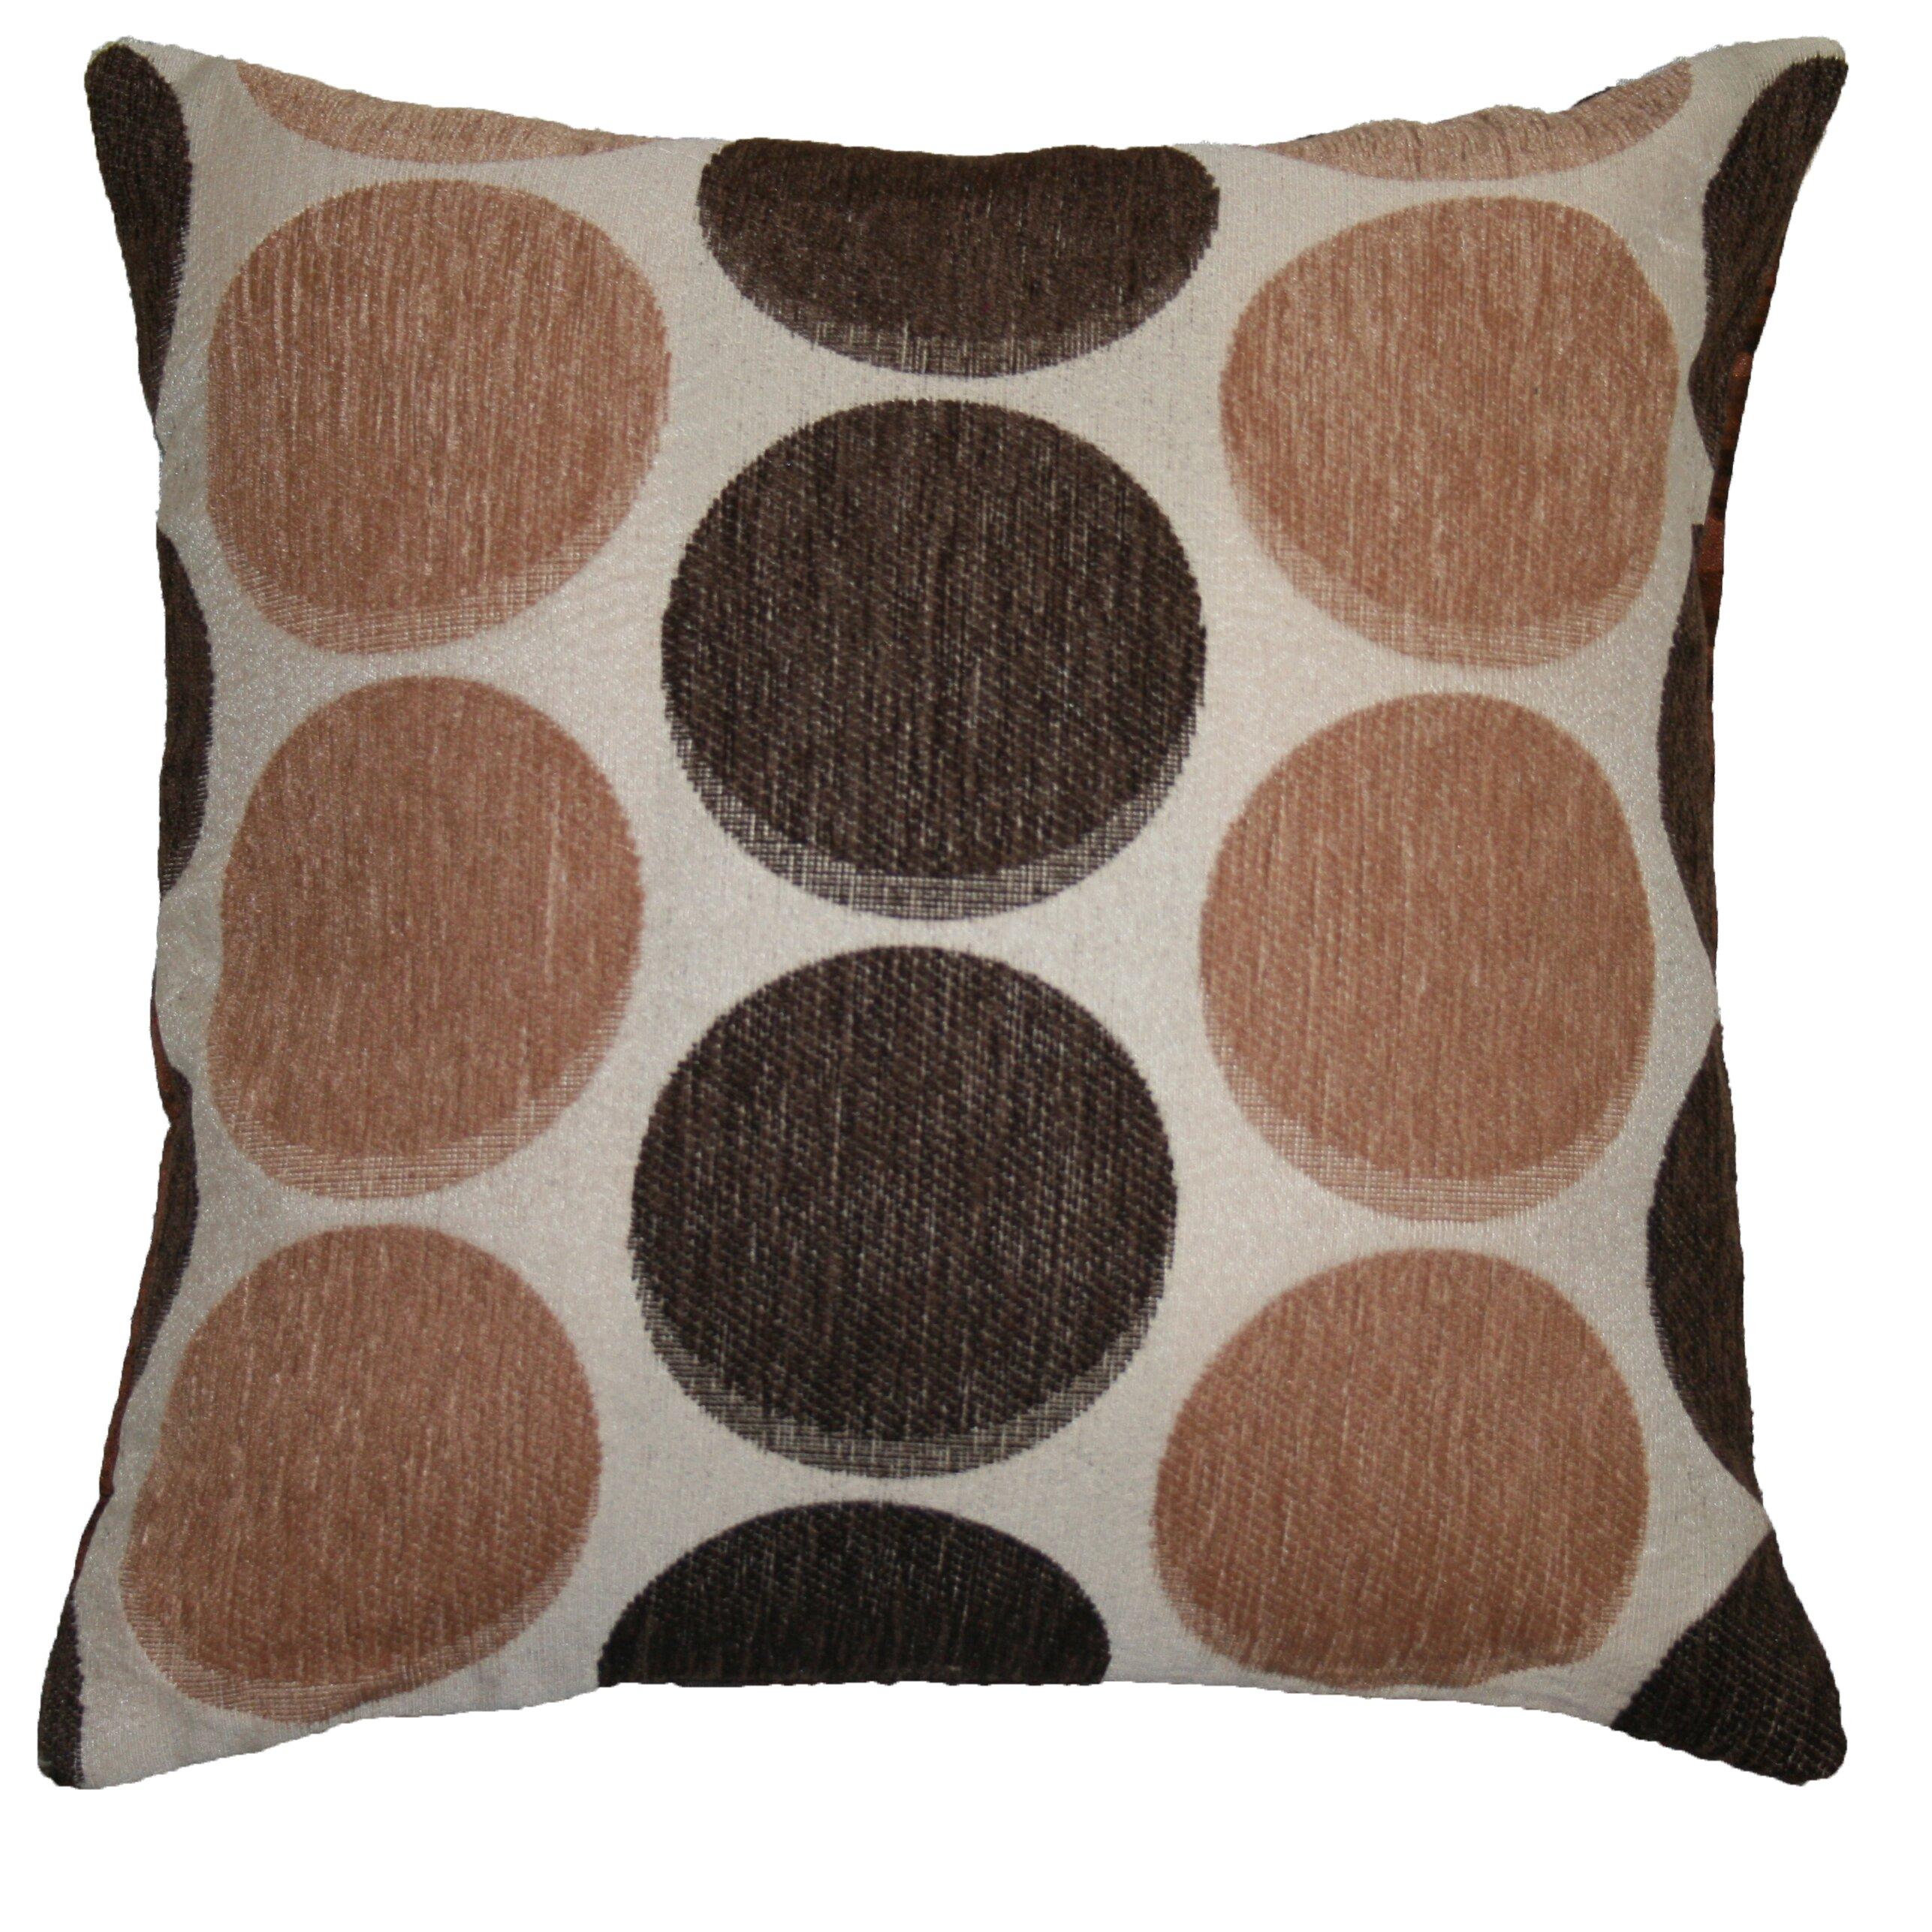 Decorative Pillows With Circles : Mercury Row Eridanus Circle s Decorative Pillow Cover & Reviews Wayfair